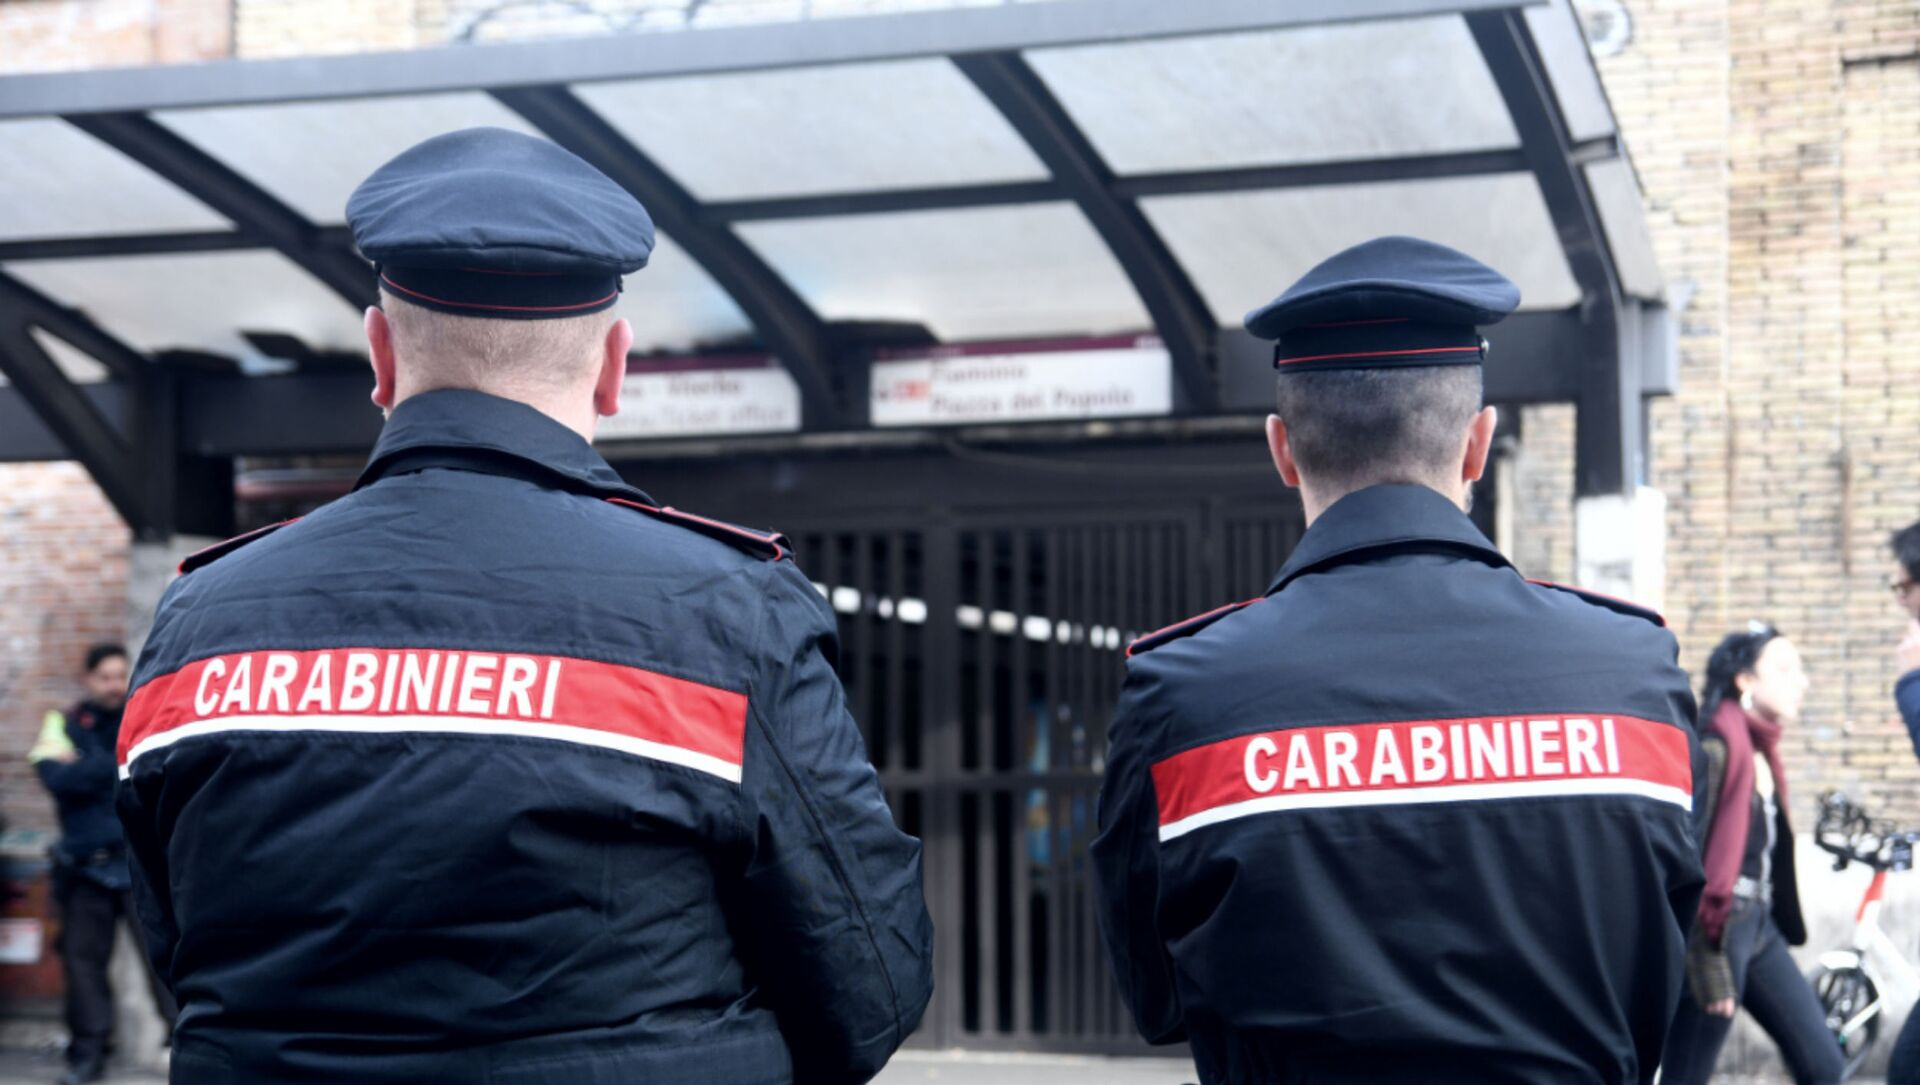 I carabinieri  - Sputnik Italia, 1920, 25.03.2021